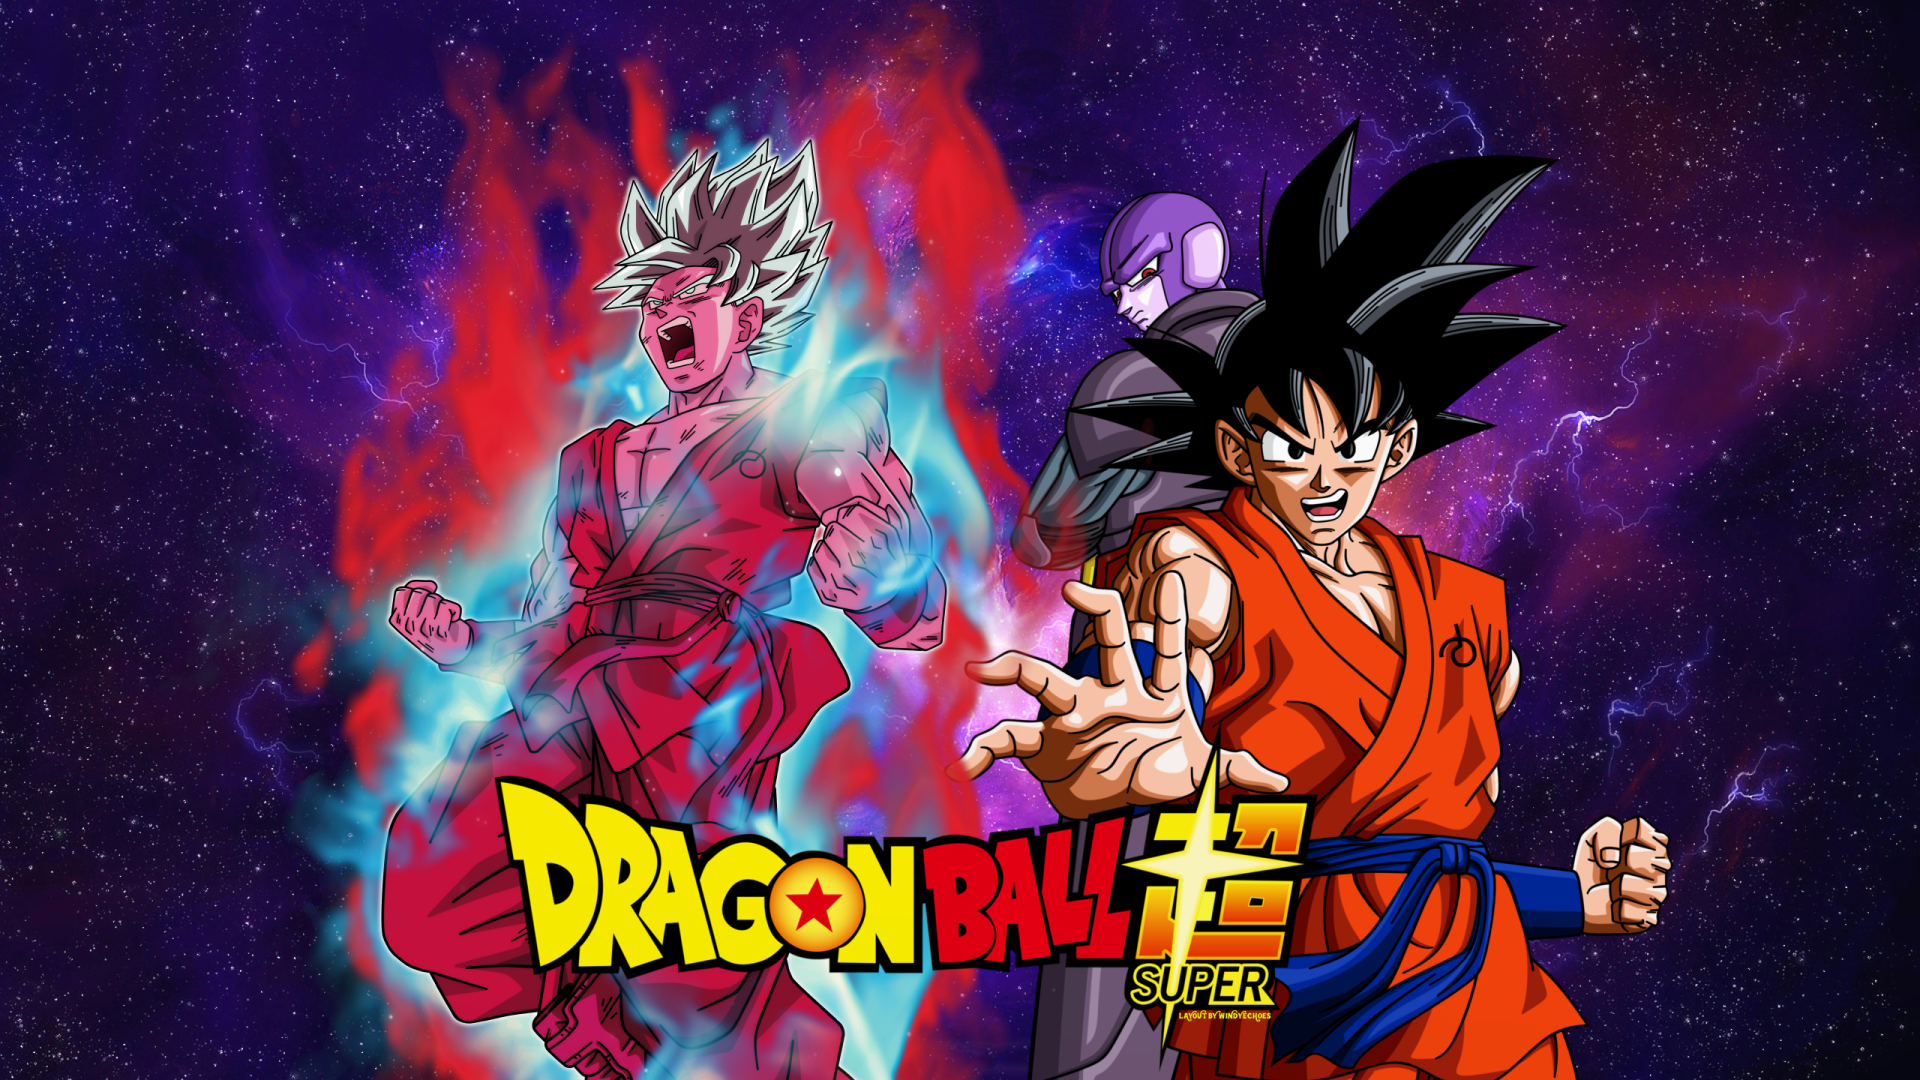 Dragon Ball Super Hd Wallpaper: Dragon Ball Super HD Wallpaper